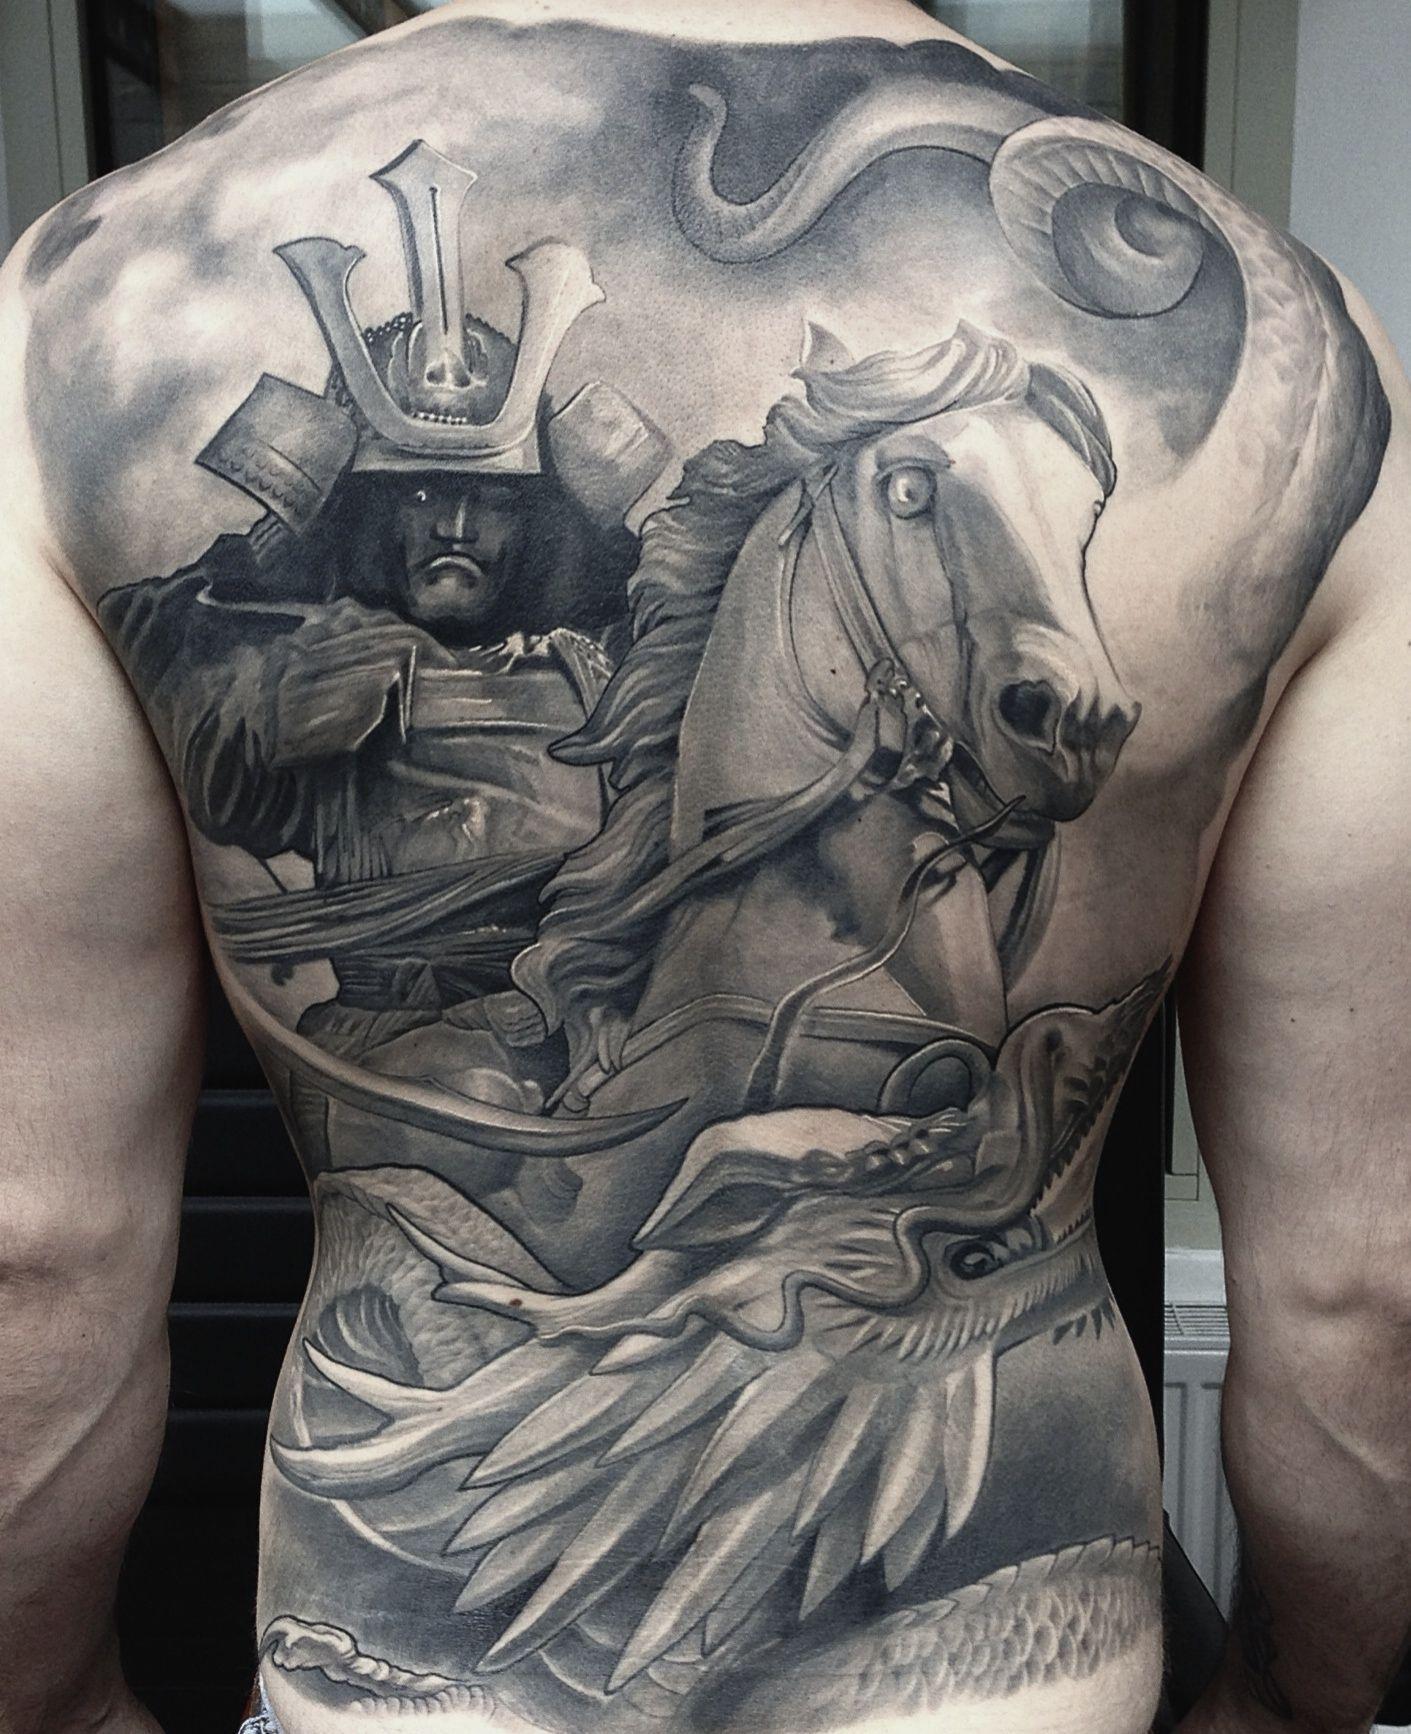 32369d19f0c23 samurai back tattoo designs | Tatoo body Design | Back tattoo, Back ...